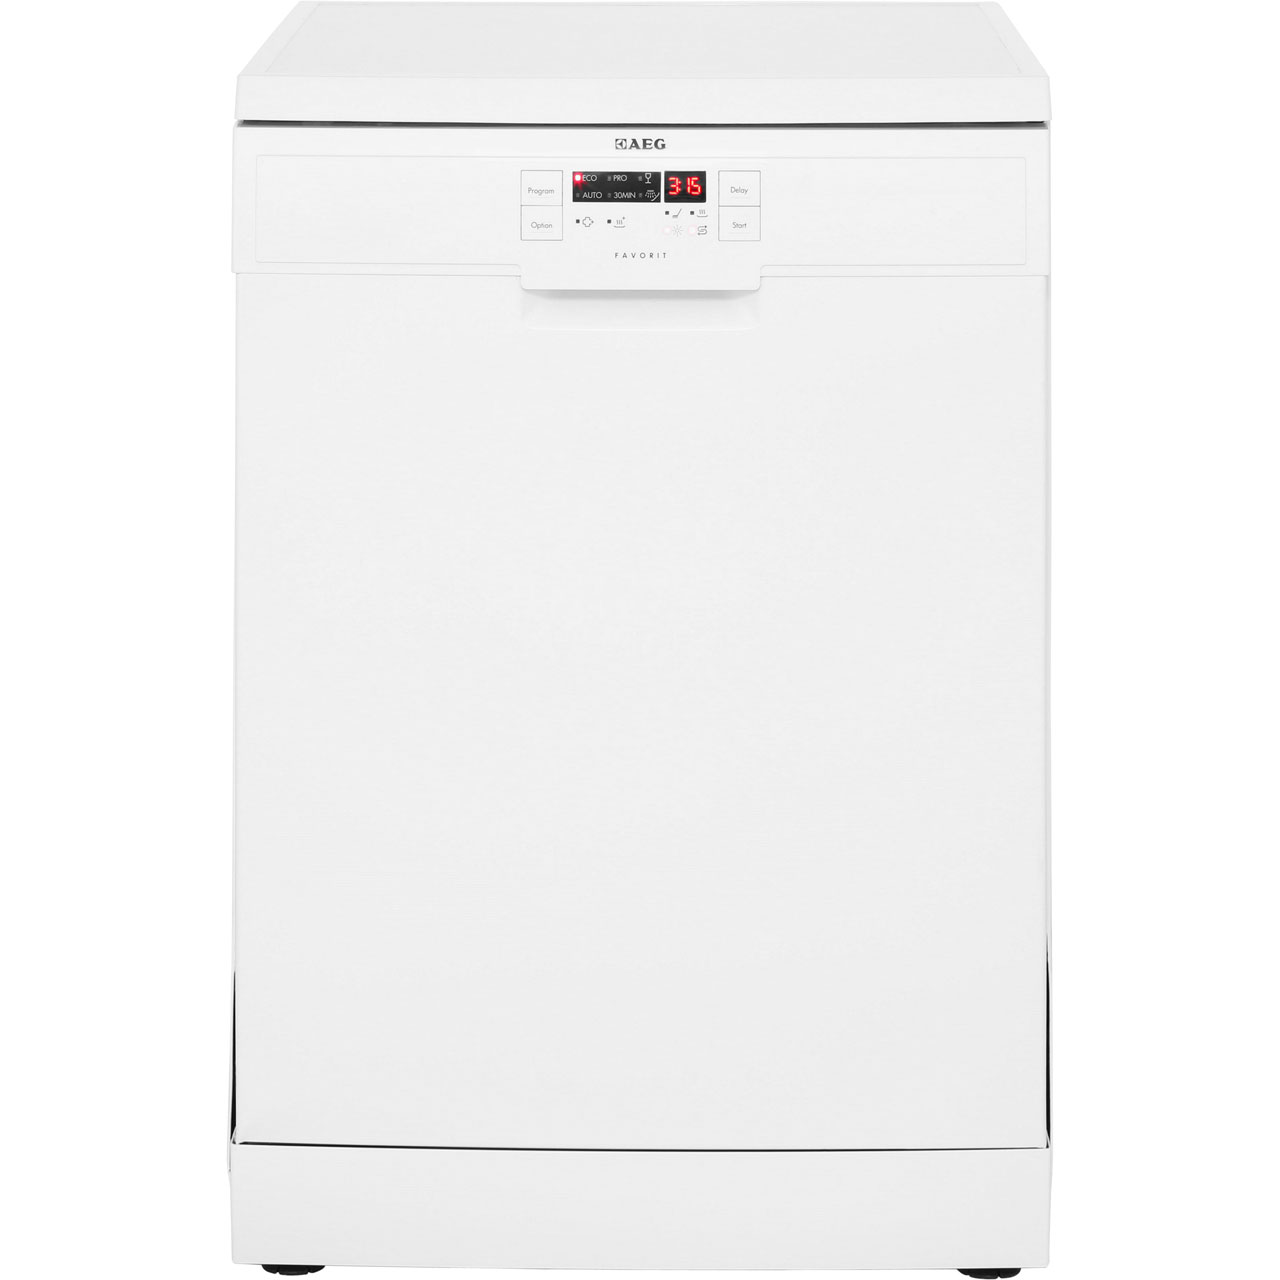 AEG Favorit F56305W0 Free Standing Dishwasher in White